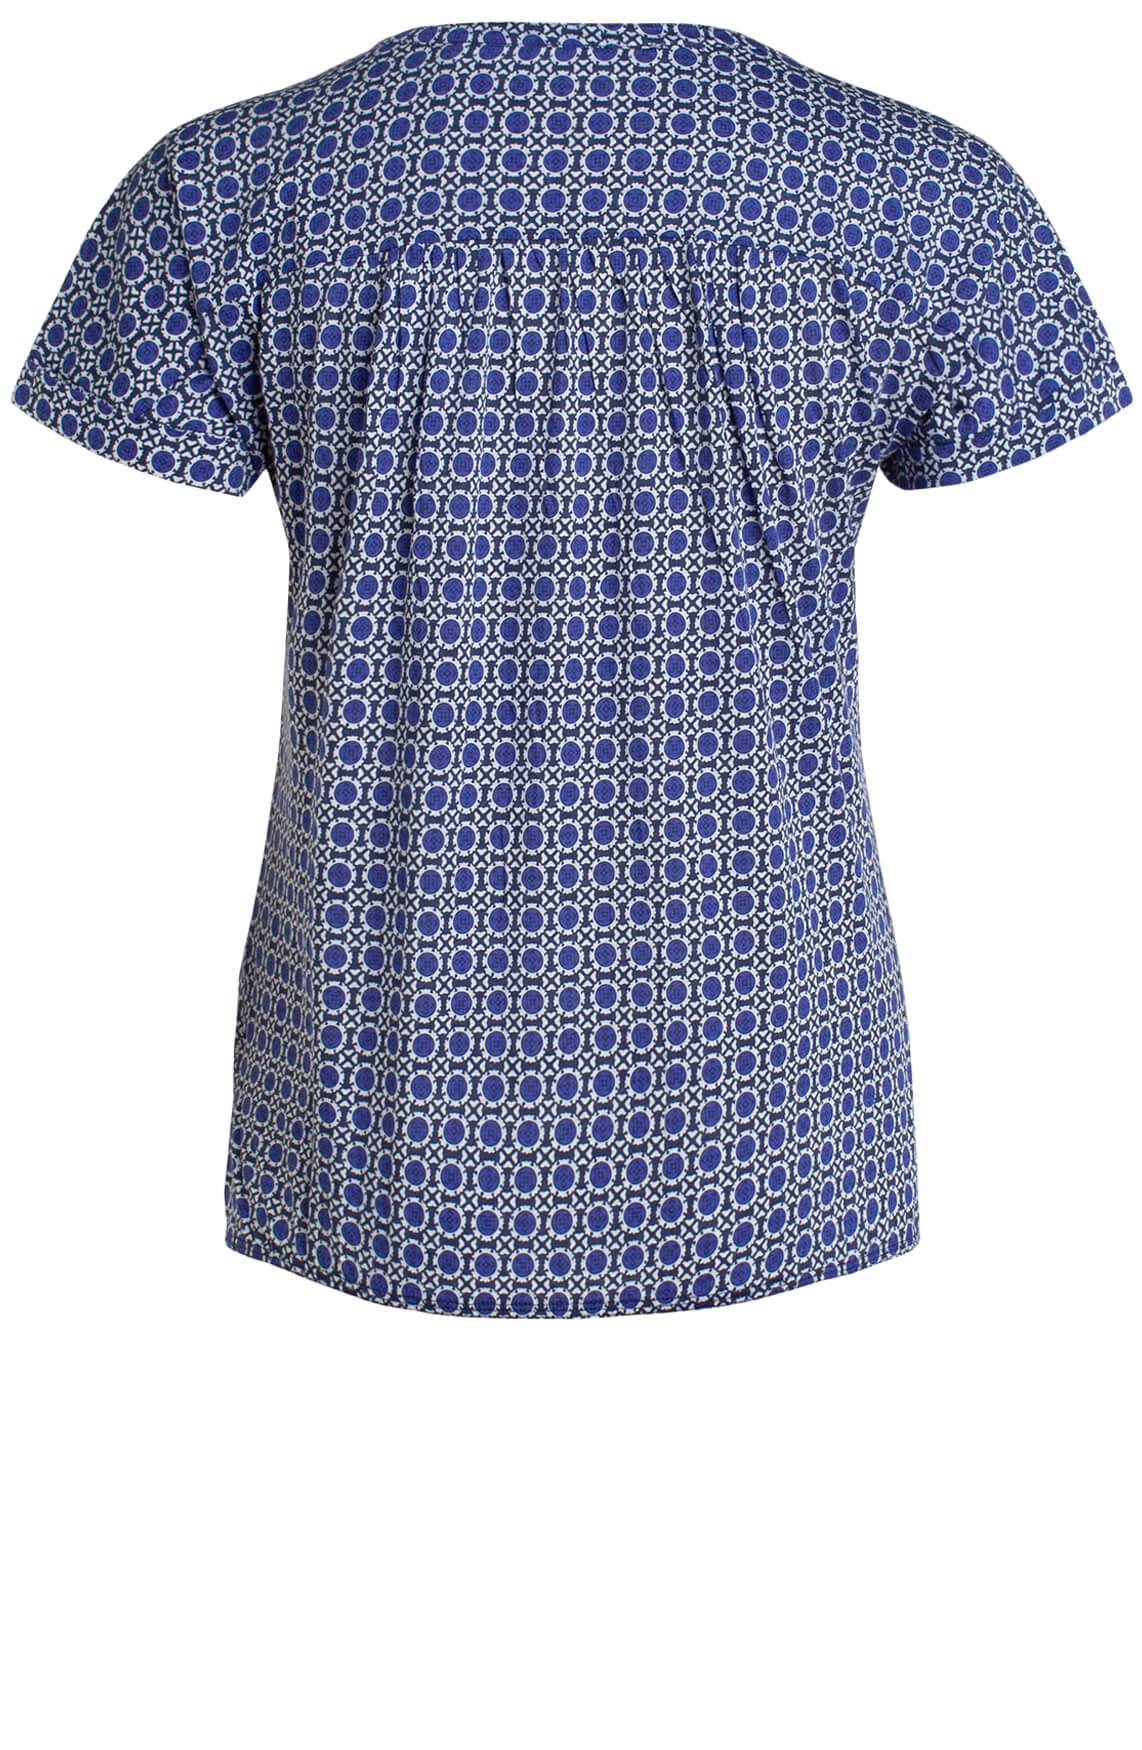 Marc O'Polo Dames Blouse met print Blauw